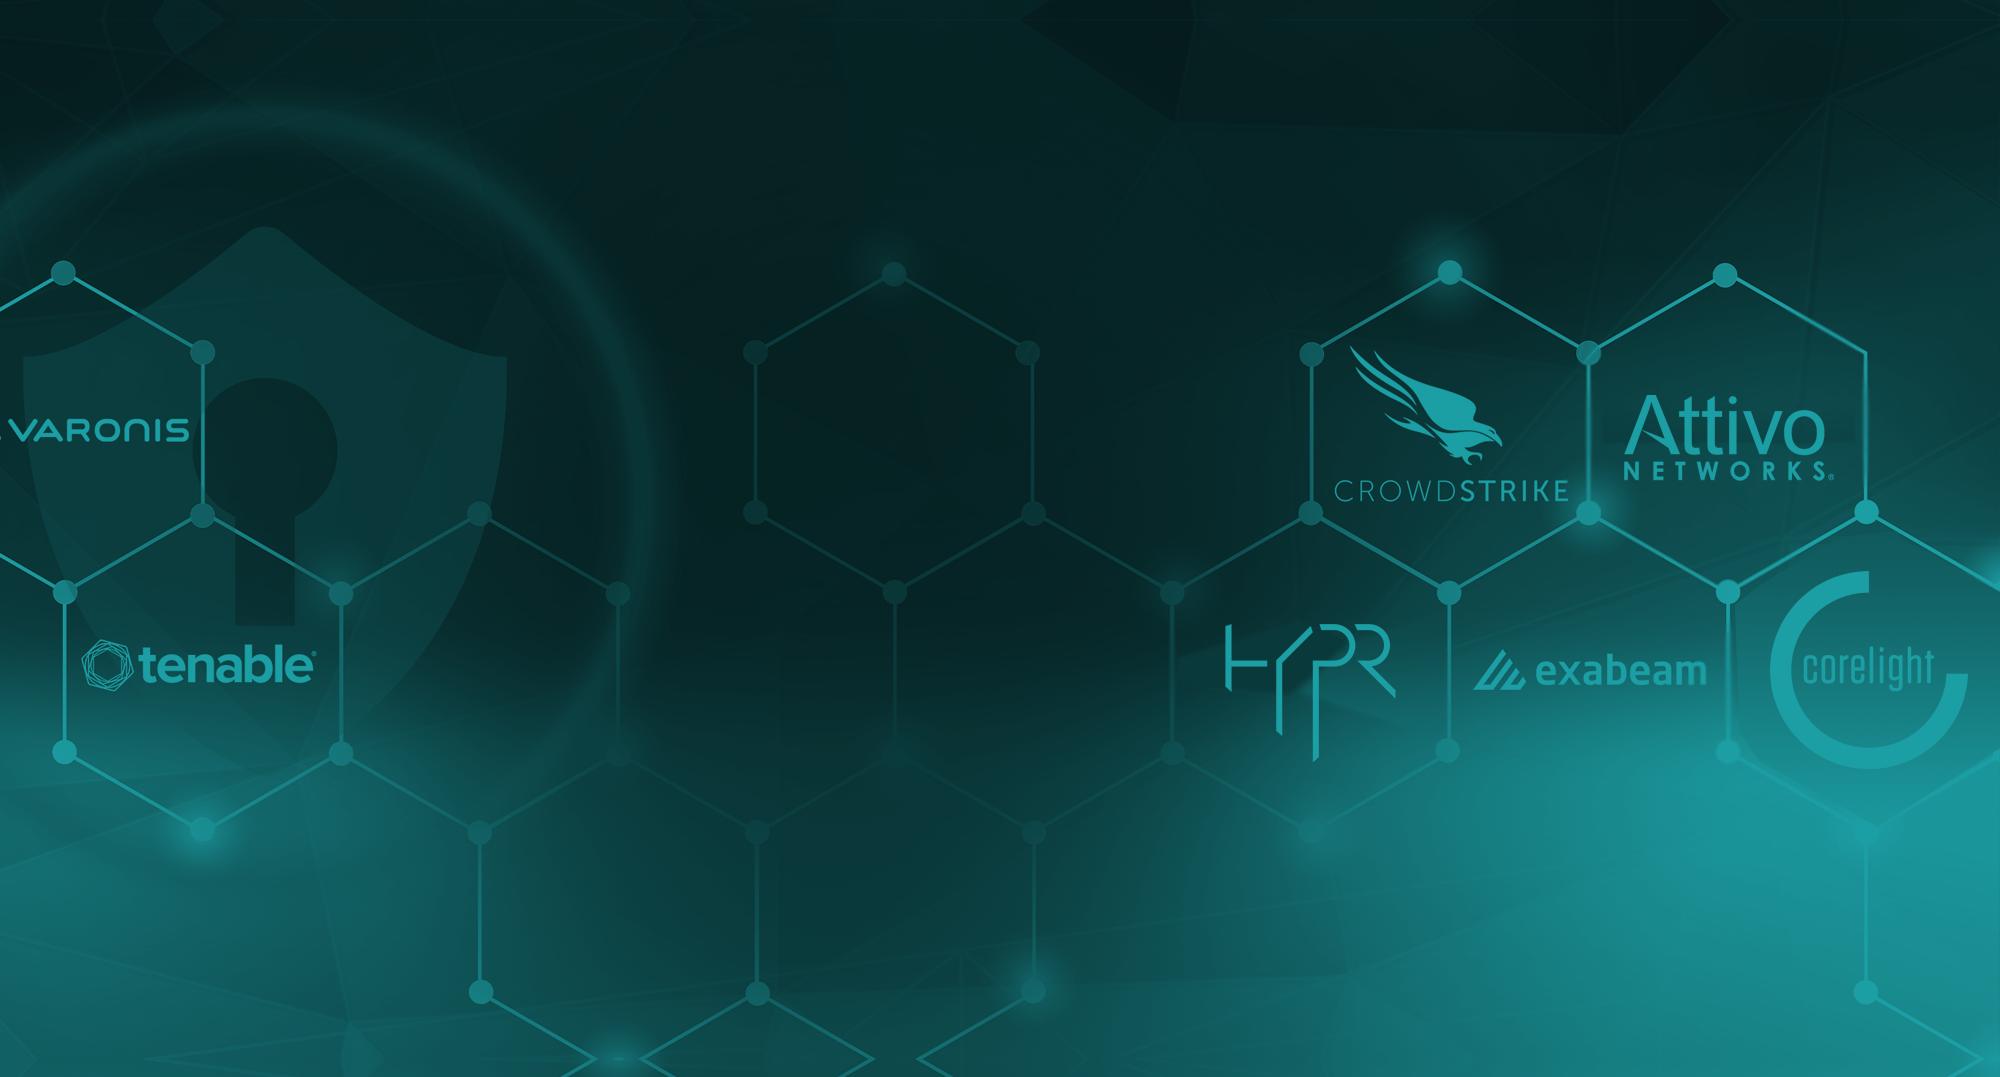 homepage-technologies-consortium